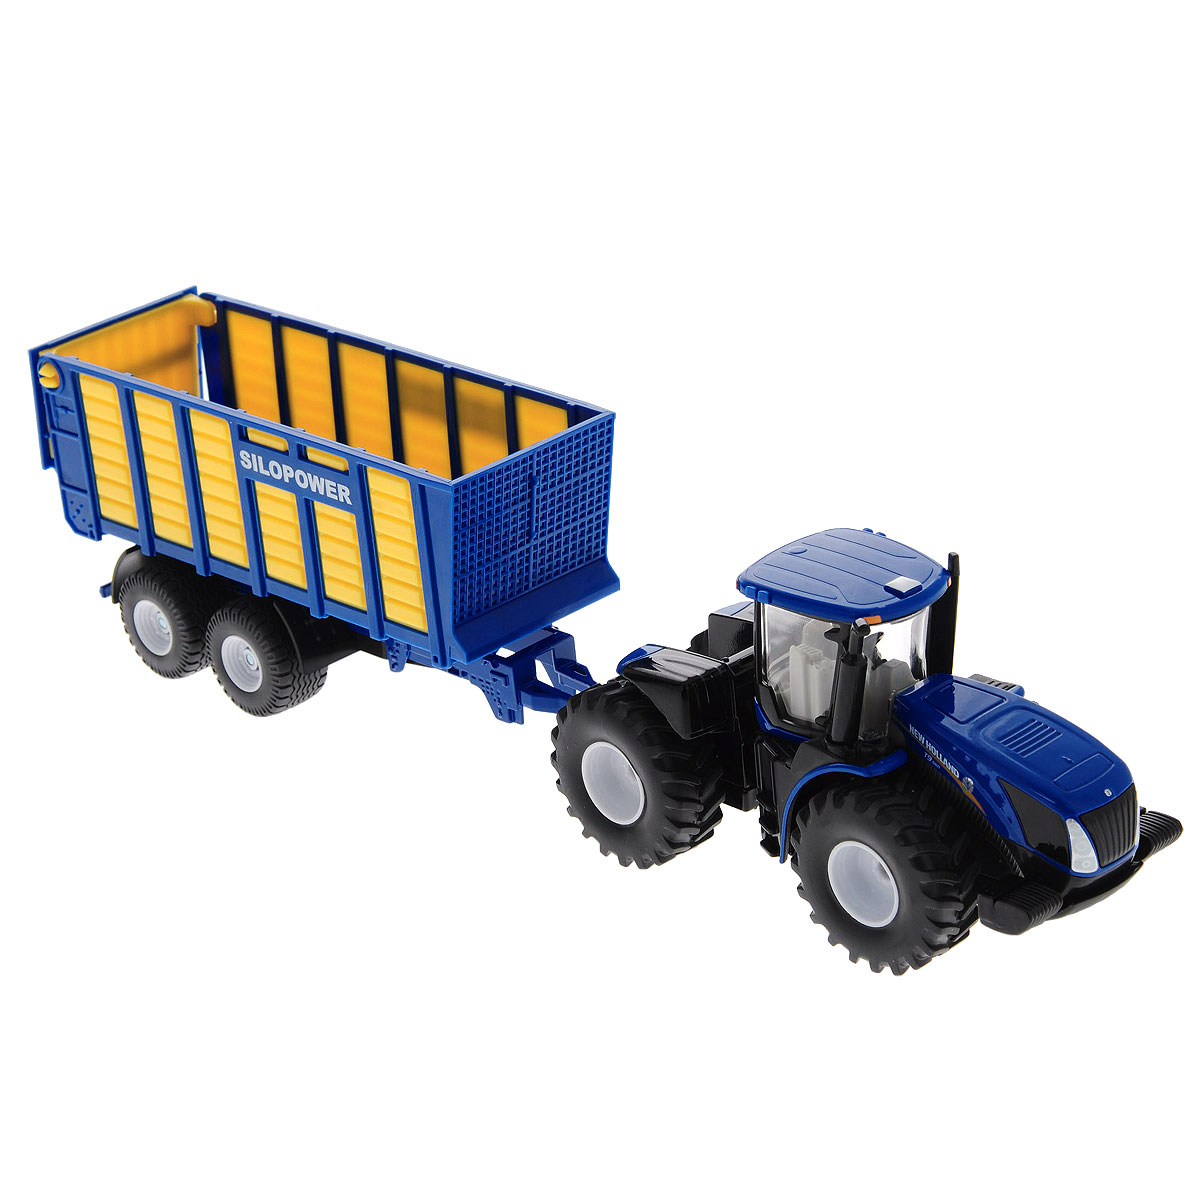 Siku Трактор New Holland T с прицепом модель трактора siku модель трактора с прицепом для бревен 1645